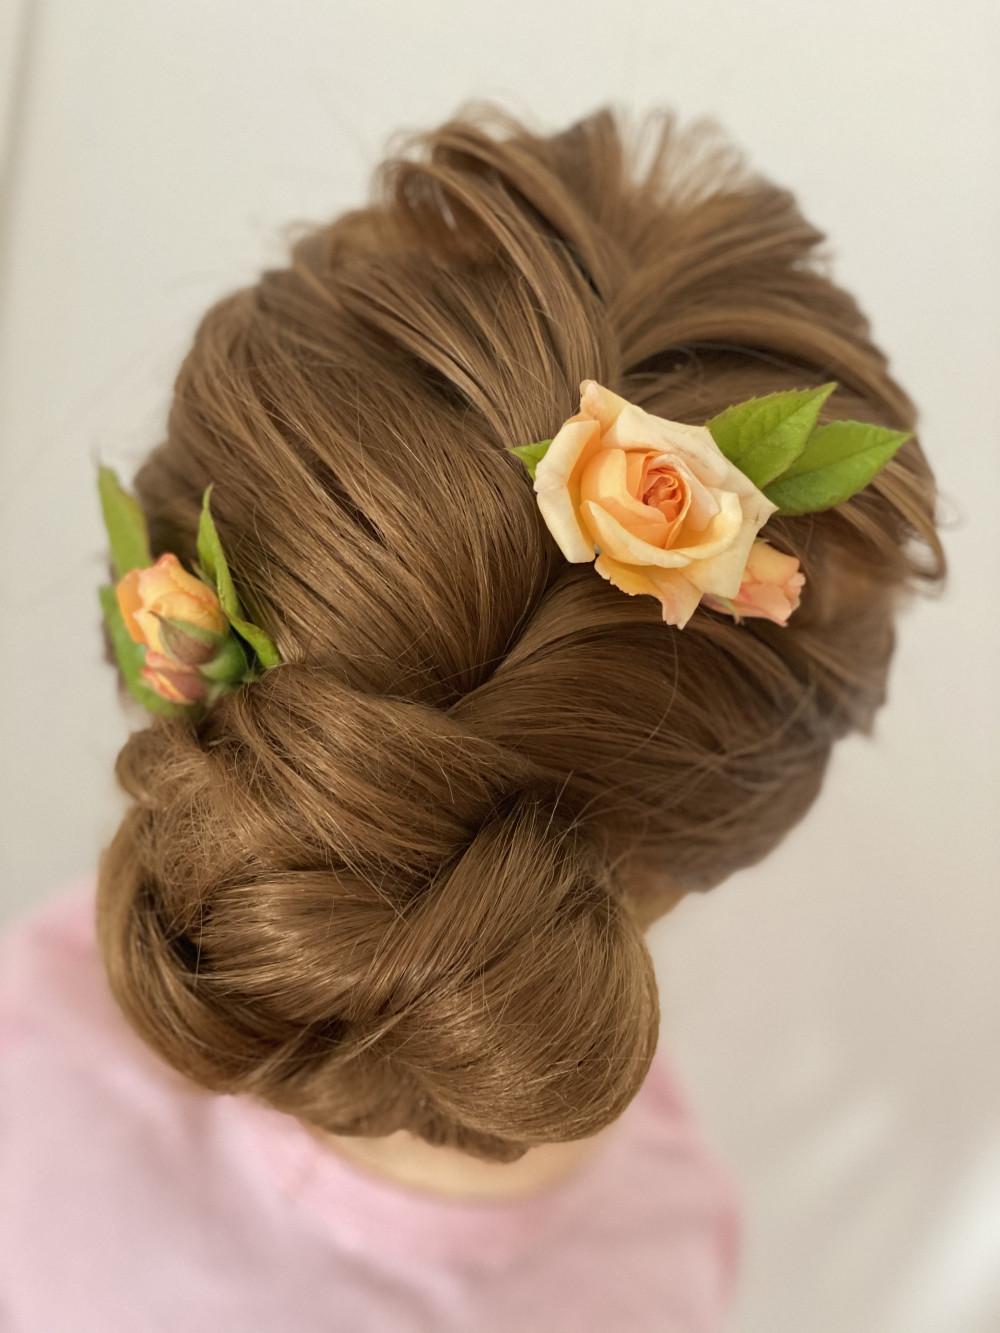 Beautiful boho style plait with bun up do on model - Make Me Bridal Artist: Abbi Parsley MUA. #bohemian #roses #flowersinherhair #flowers #bohobride #bohohair